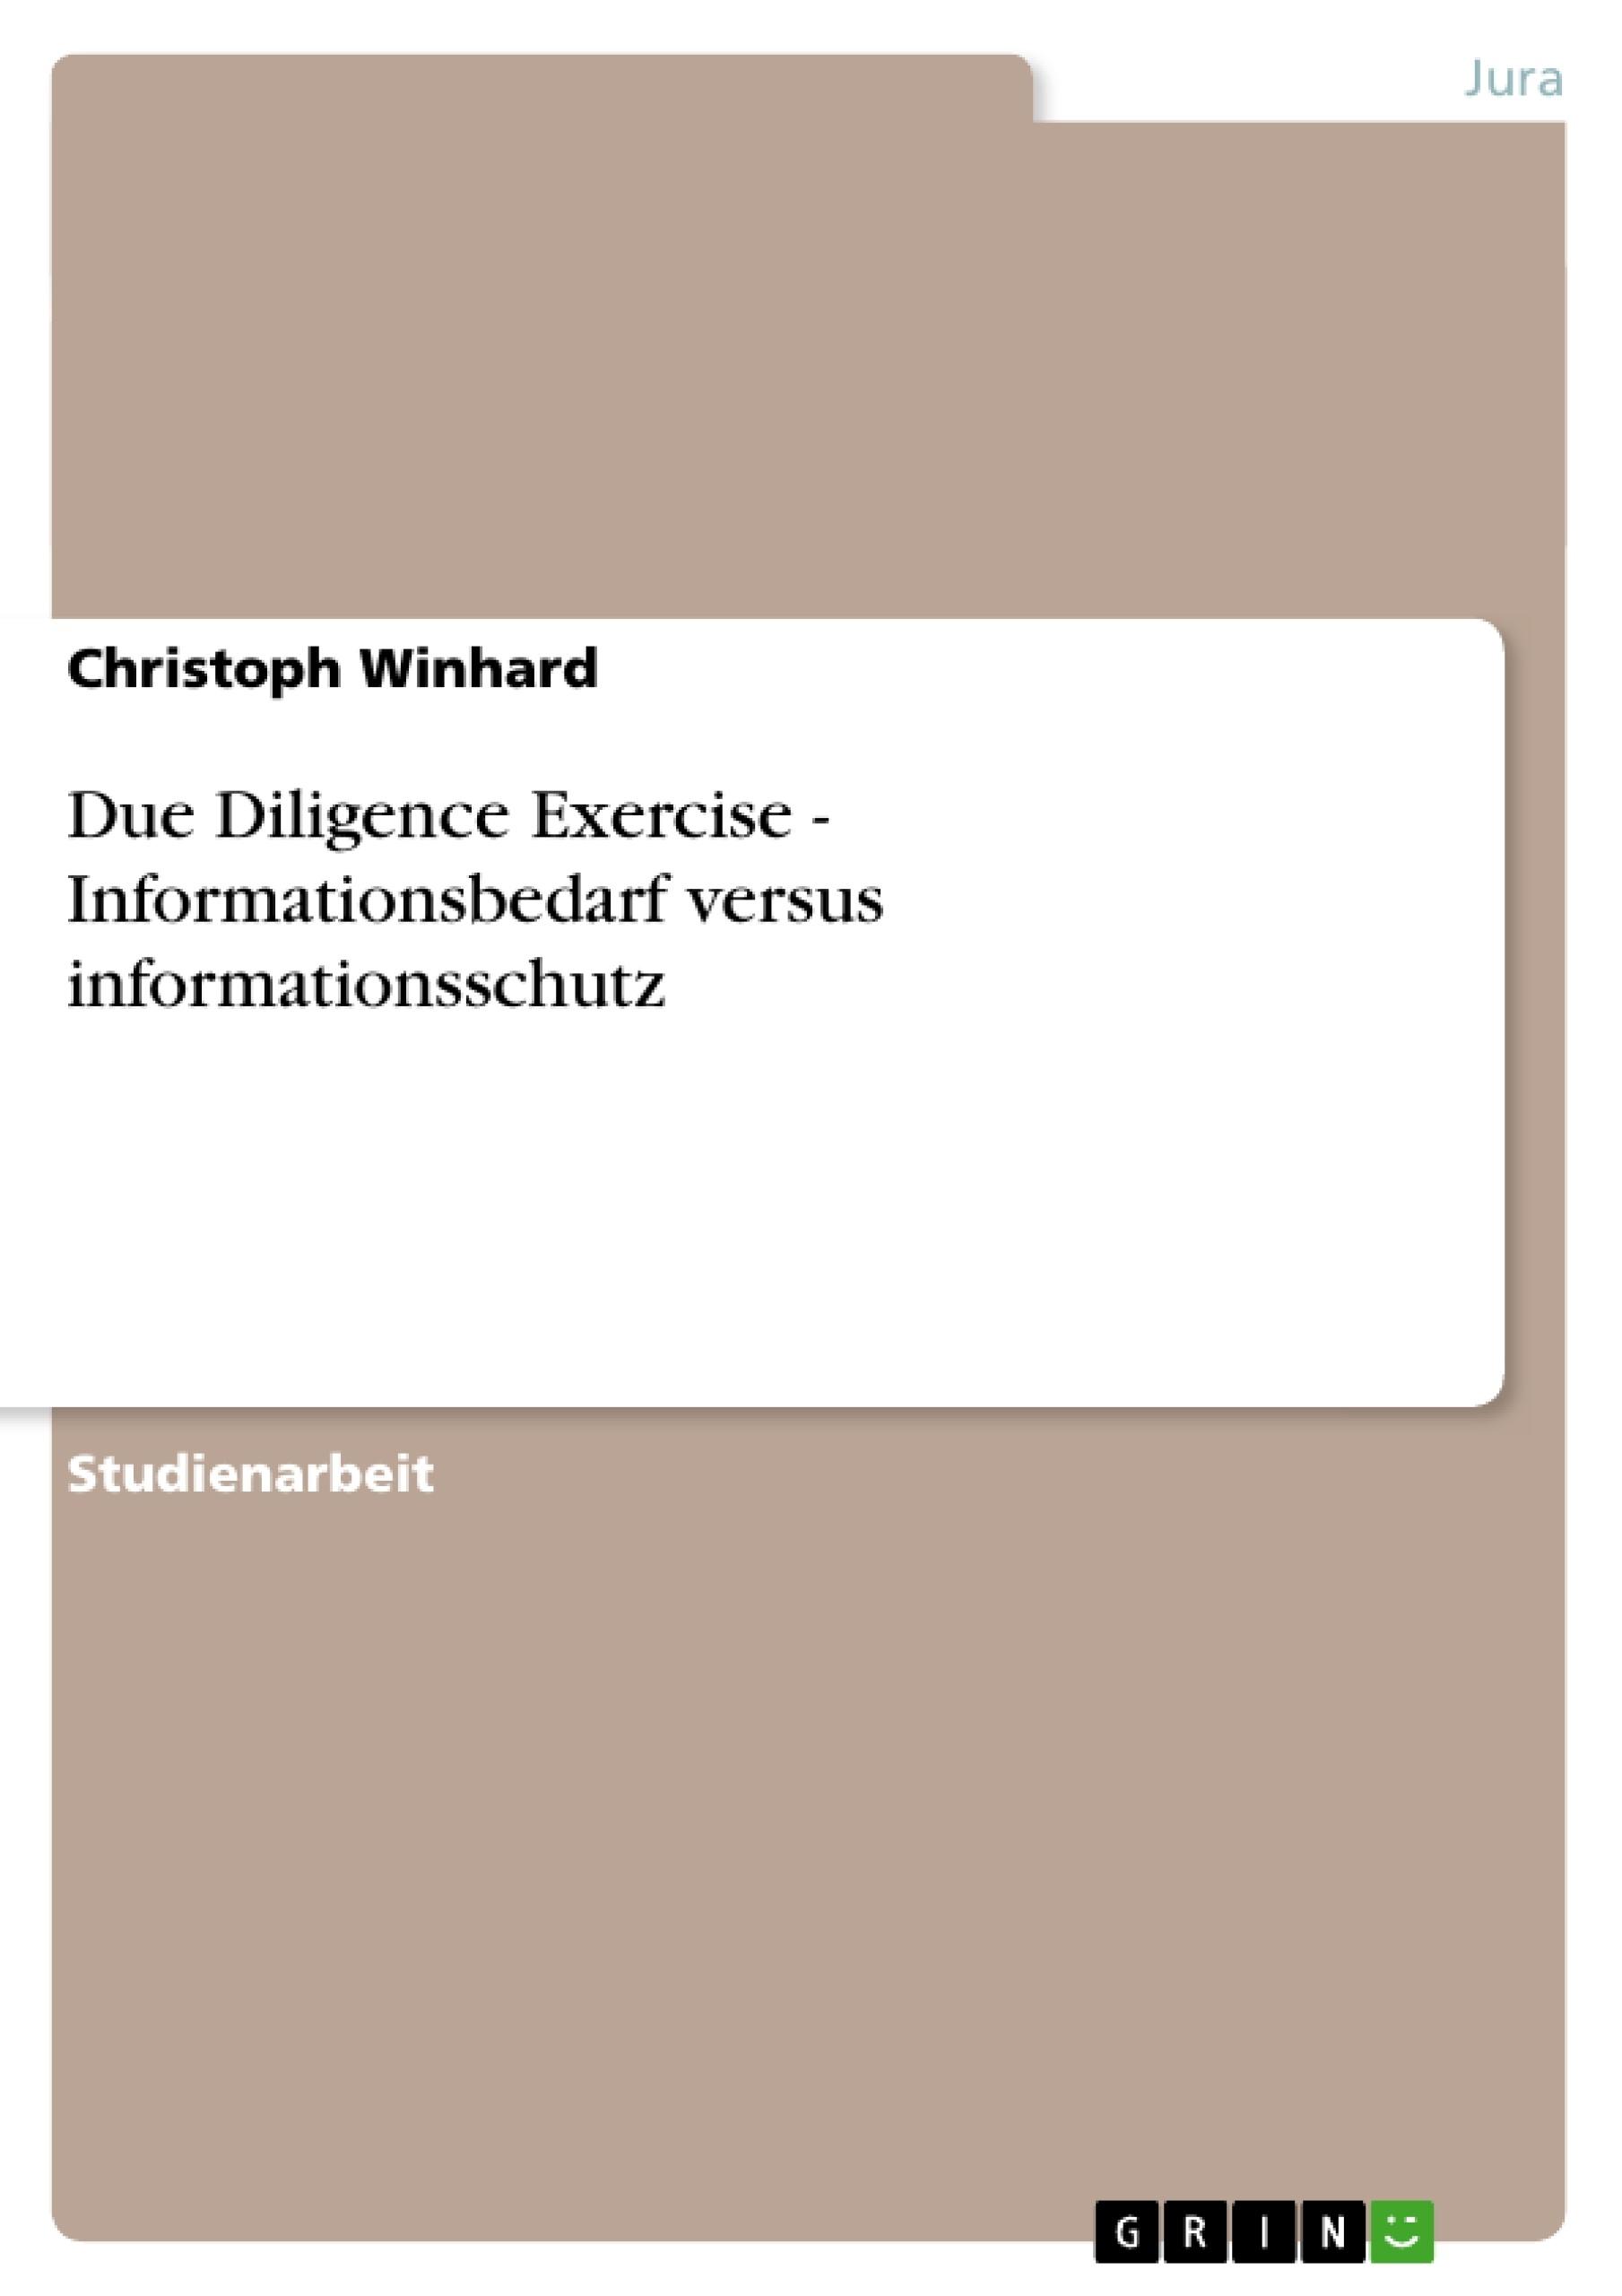 Titel: Due Diligence Exercise - Informationsbedarf versus informationsschutz